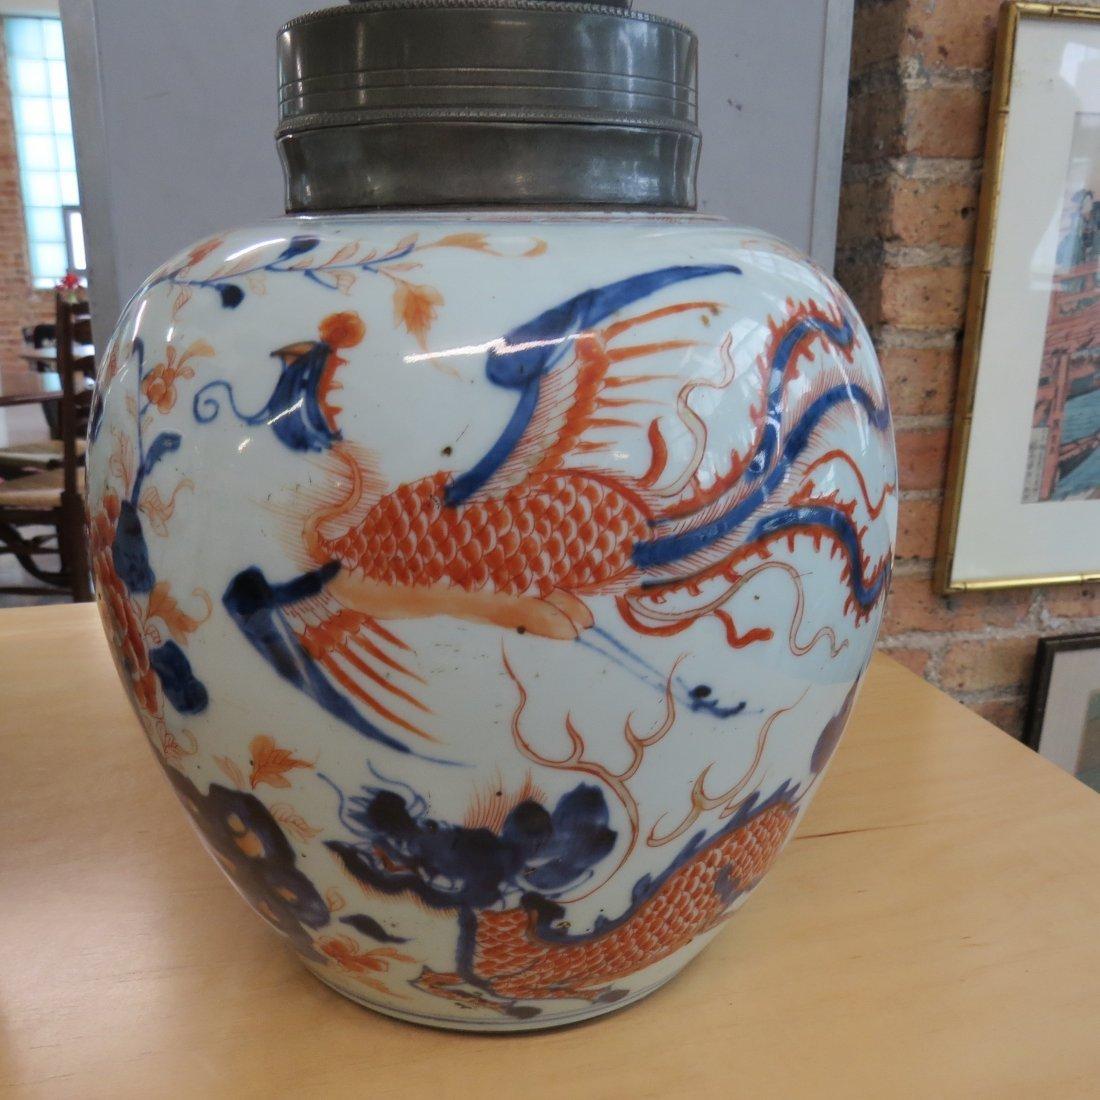 A Pair of 18th Century Chinese Porcelain Tea Caddies. - 3